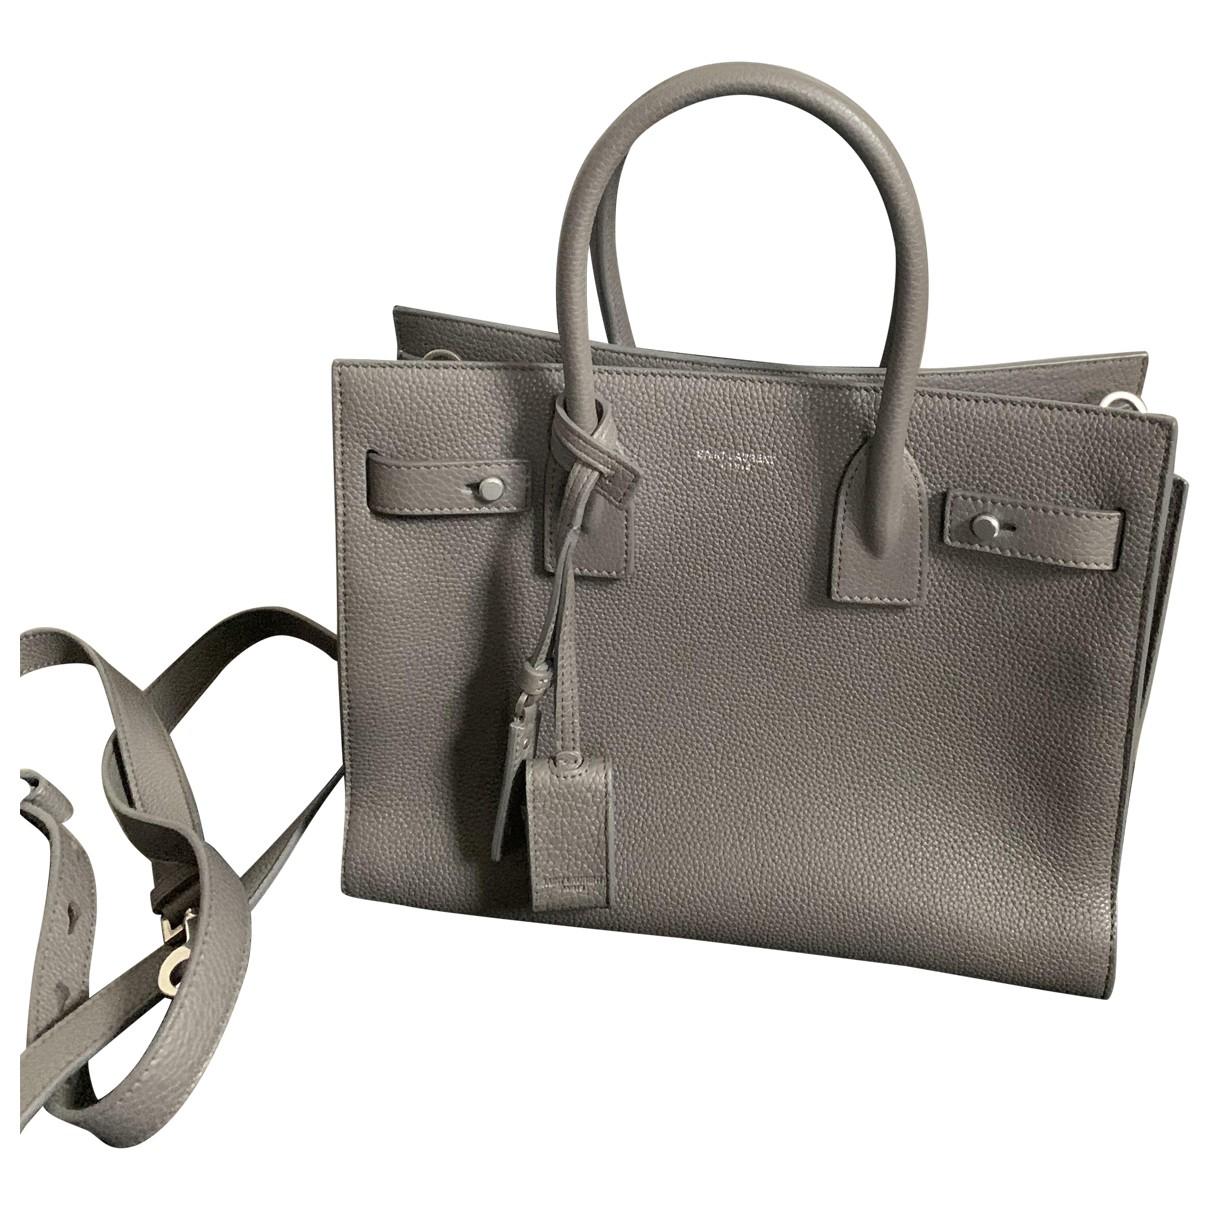 Saint Laurent Sac de Jour Grey Leather handbag for Women N